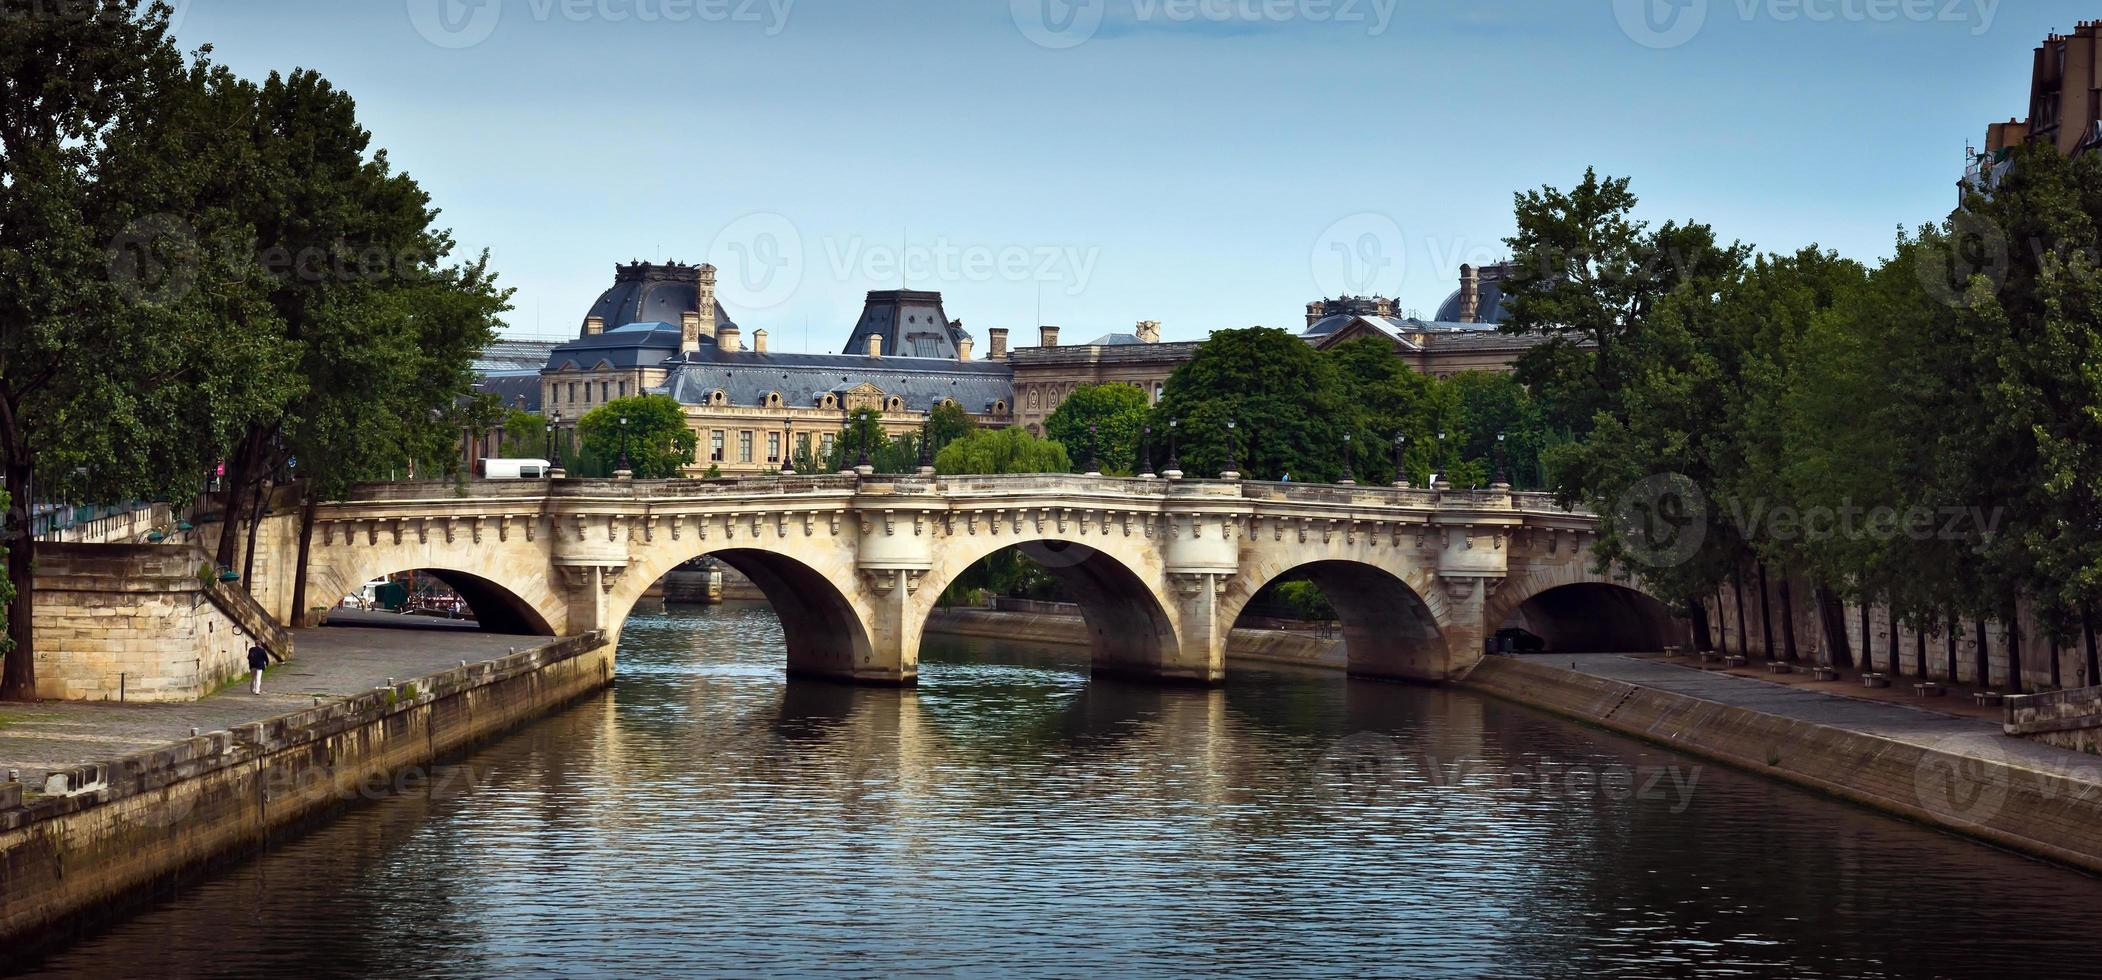 Paris - French architecture photo